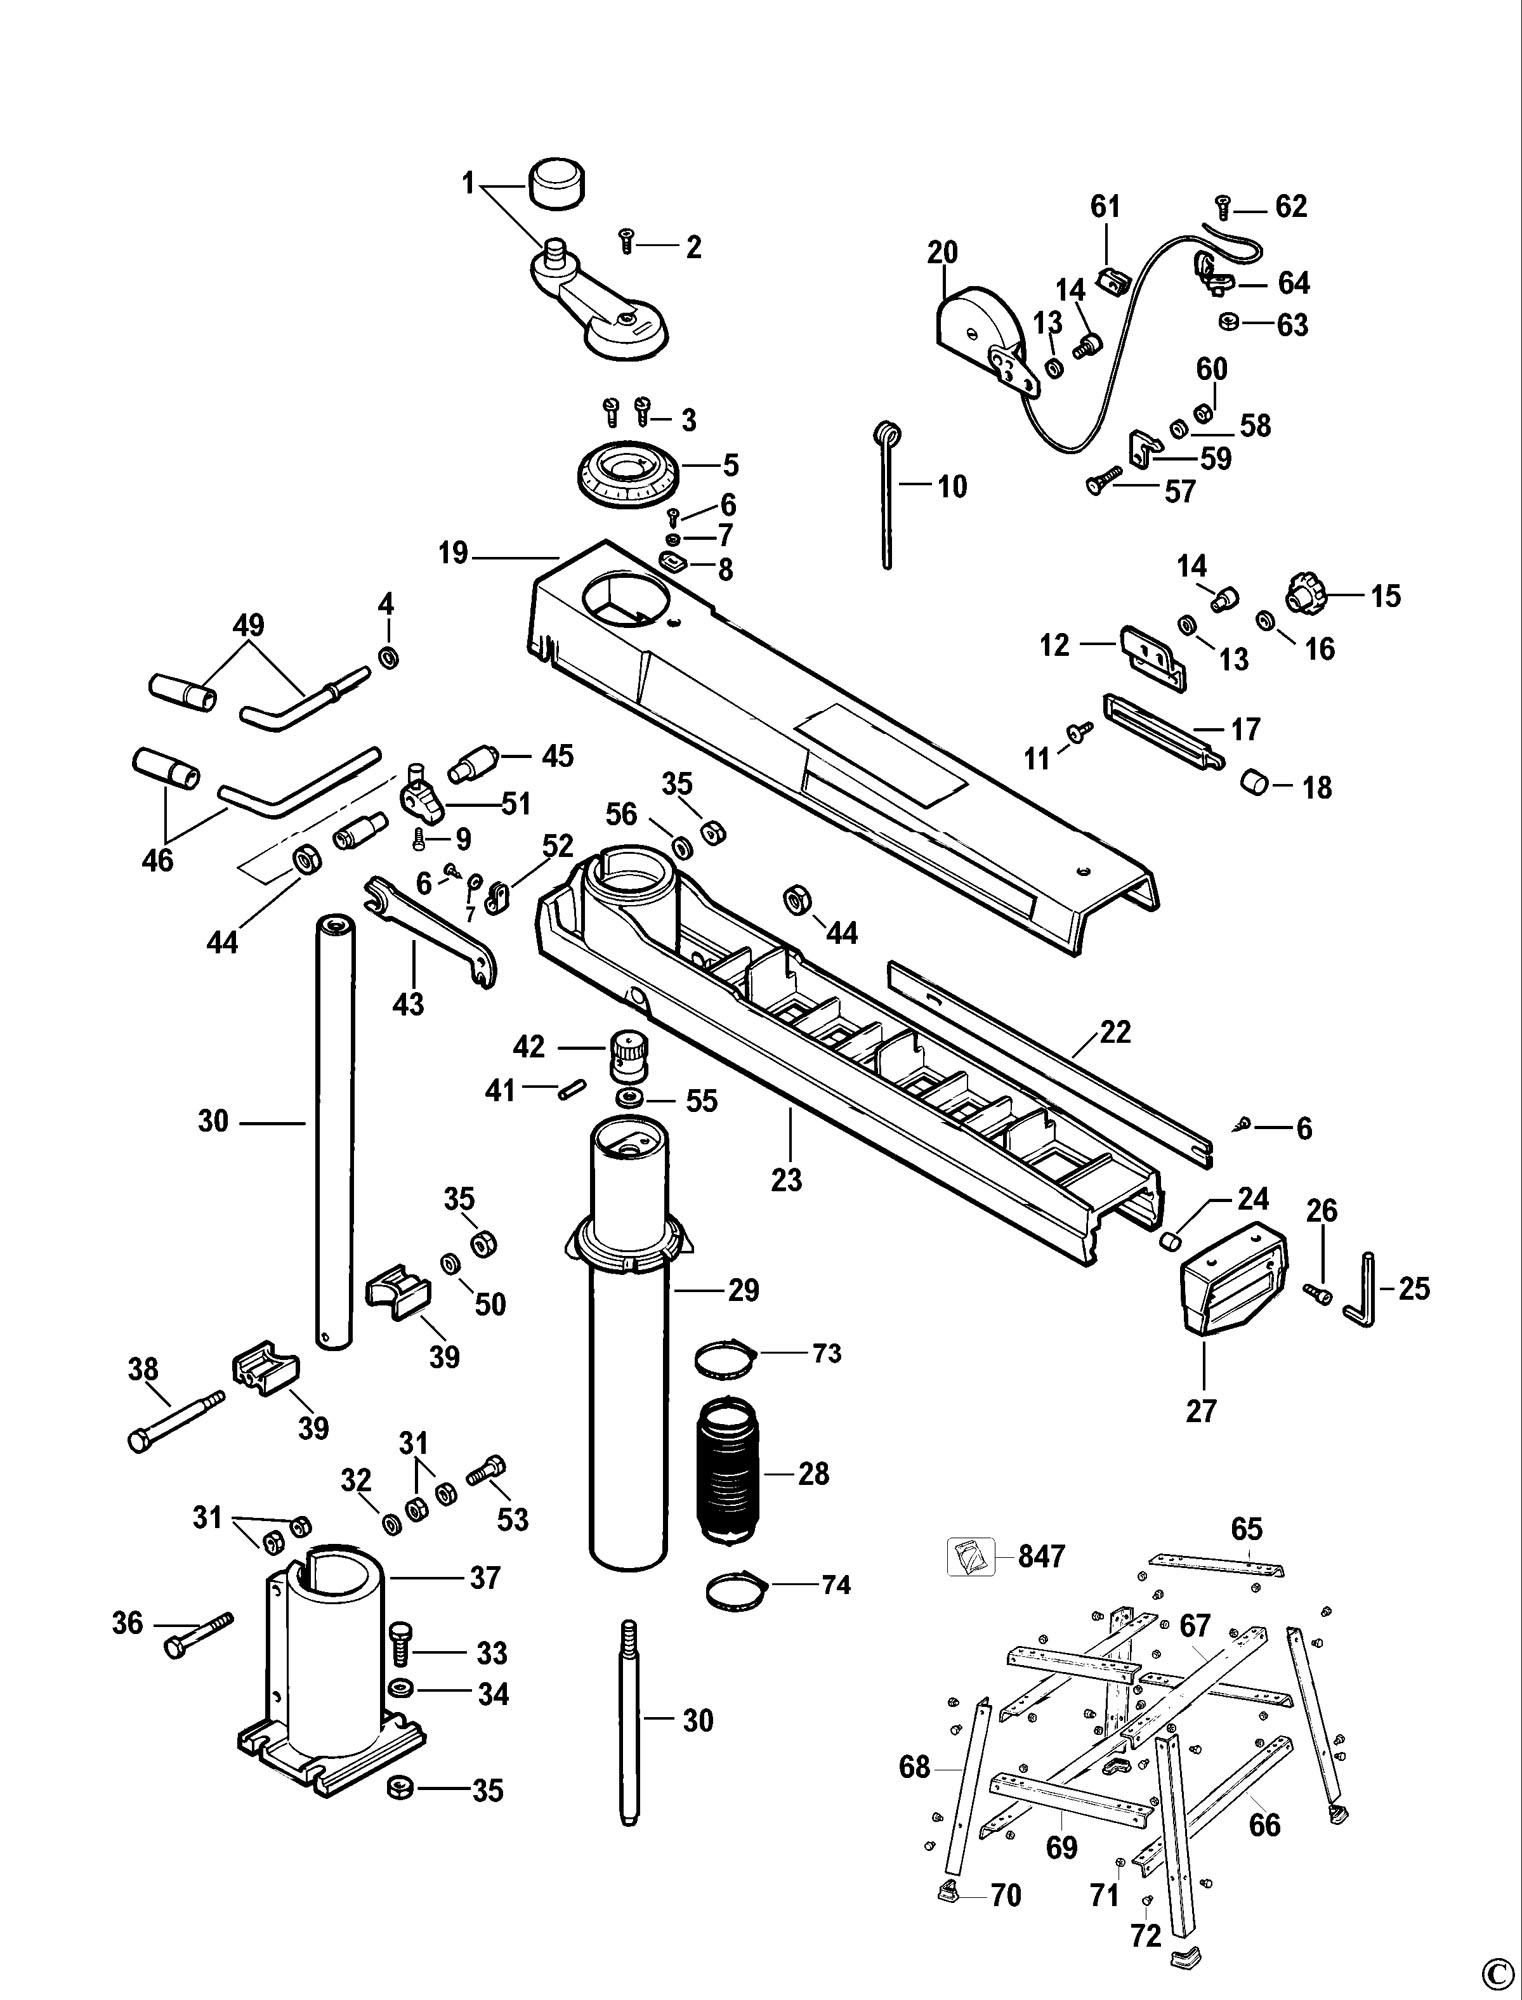 spares for dewalt dw720 radial arm saw  type 1  spare